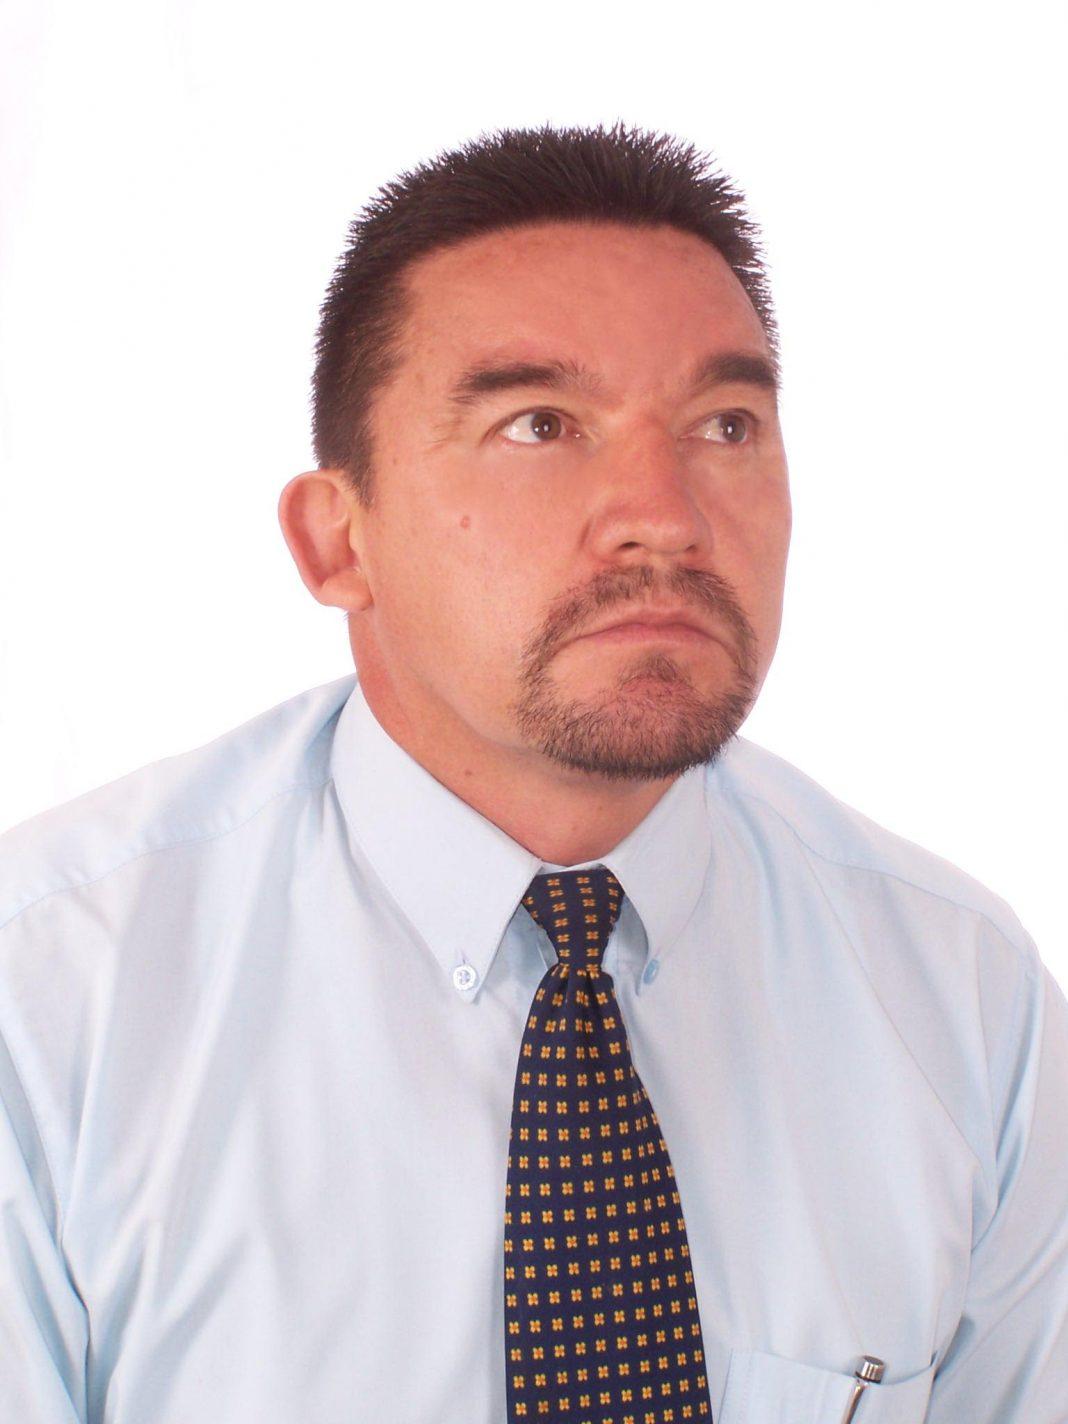 Ivan guzman